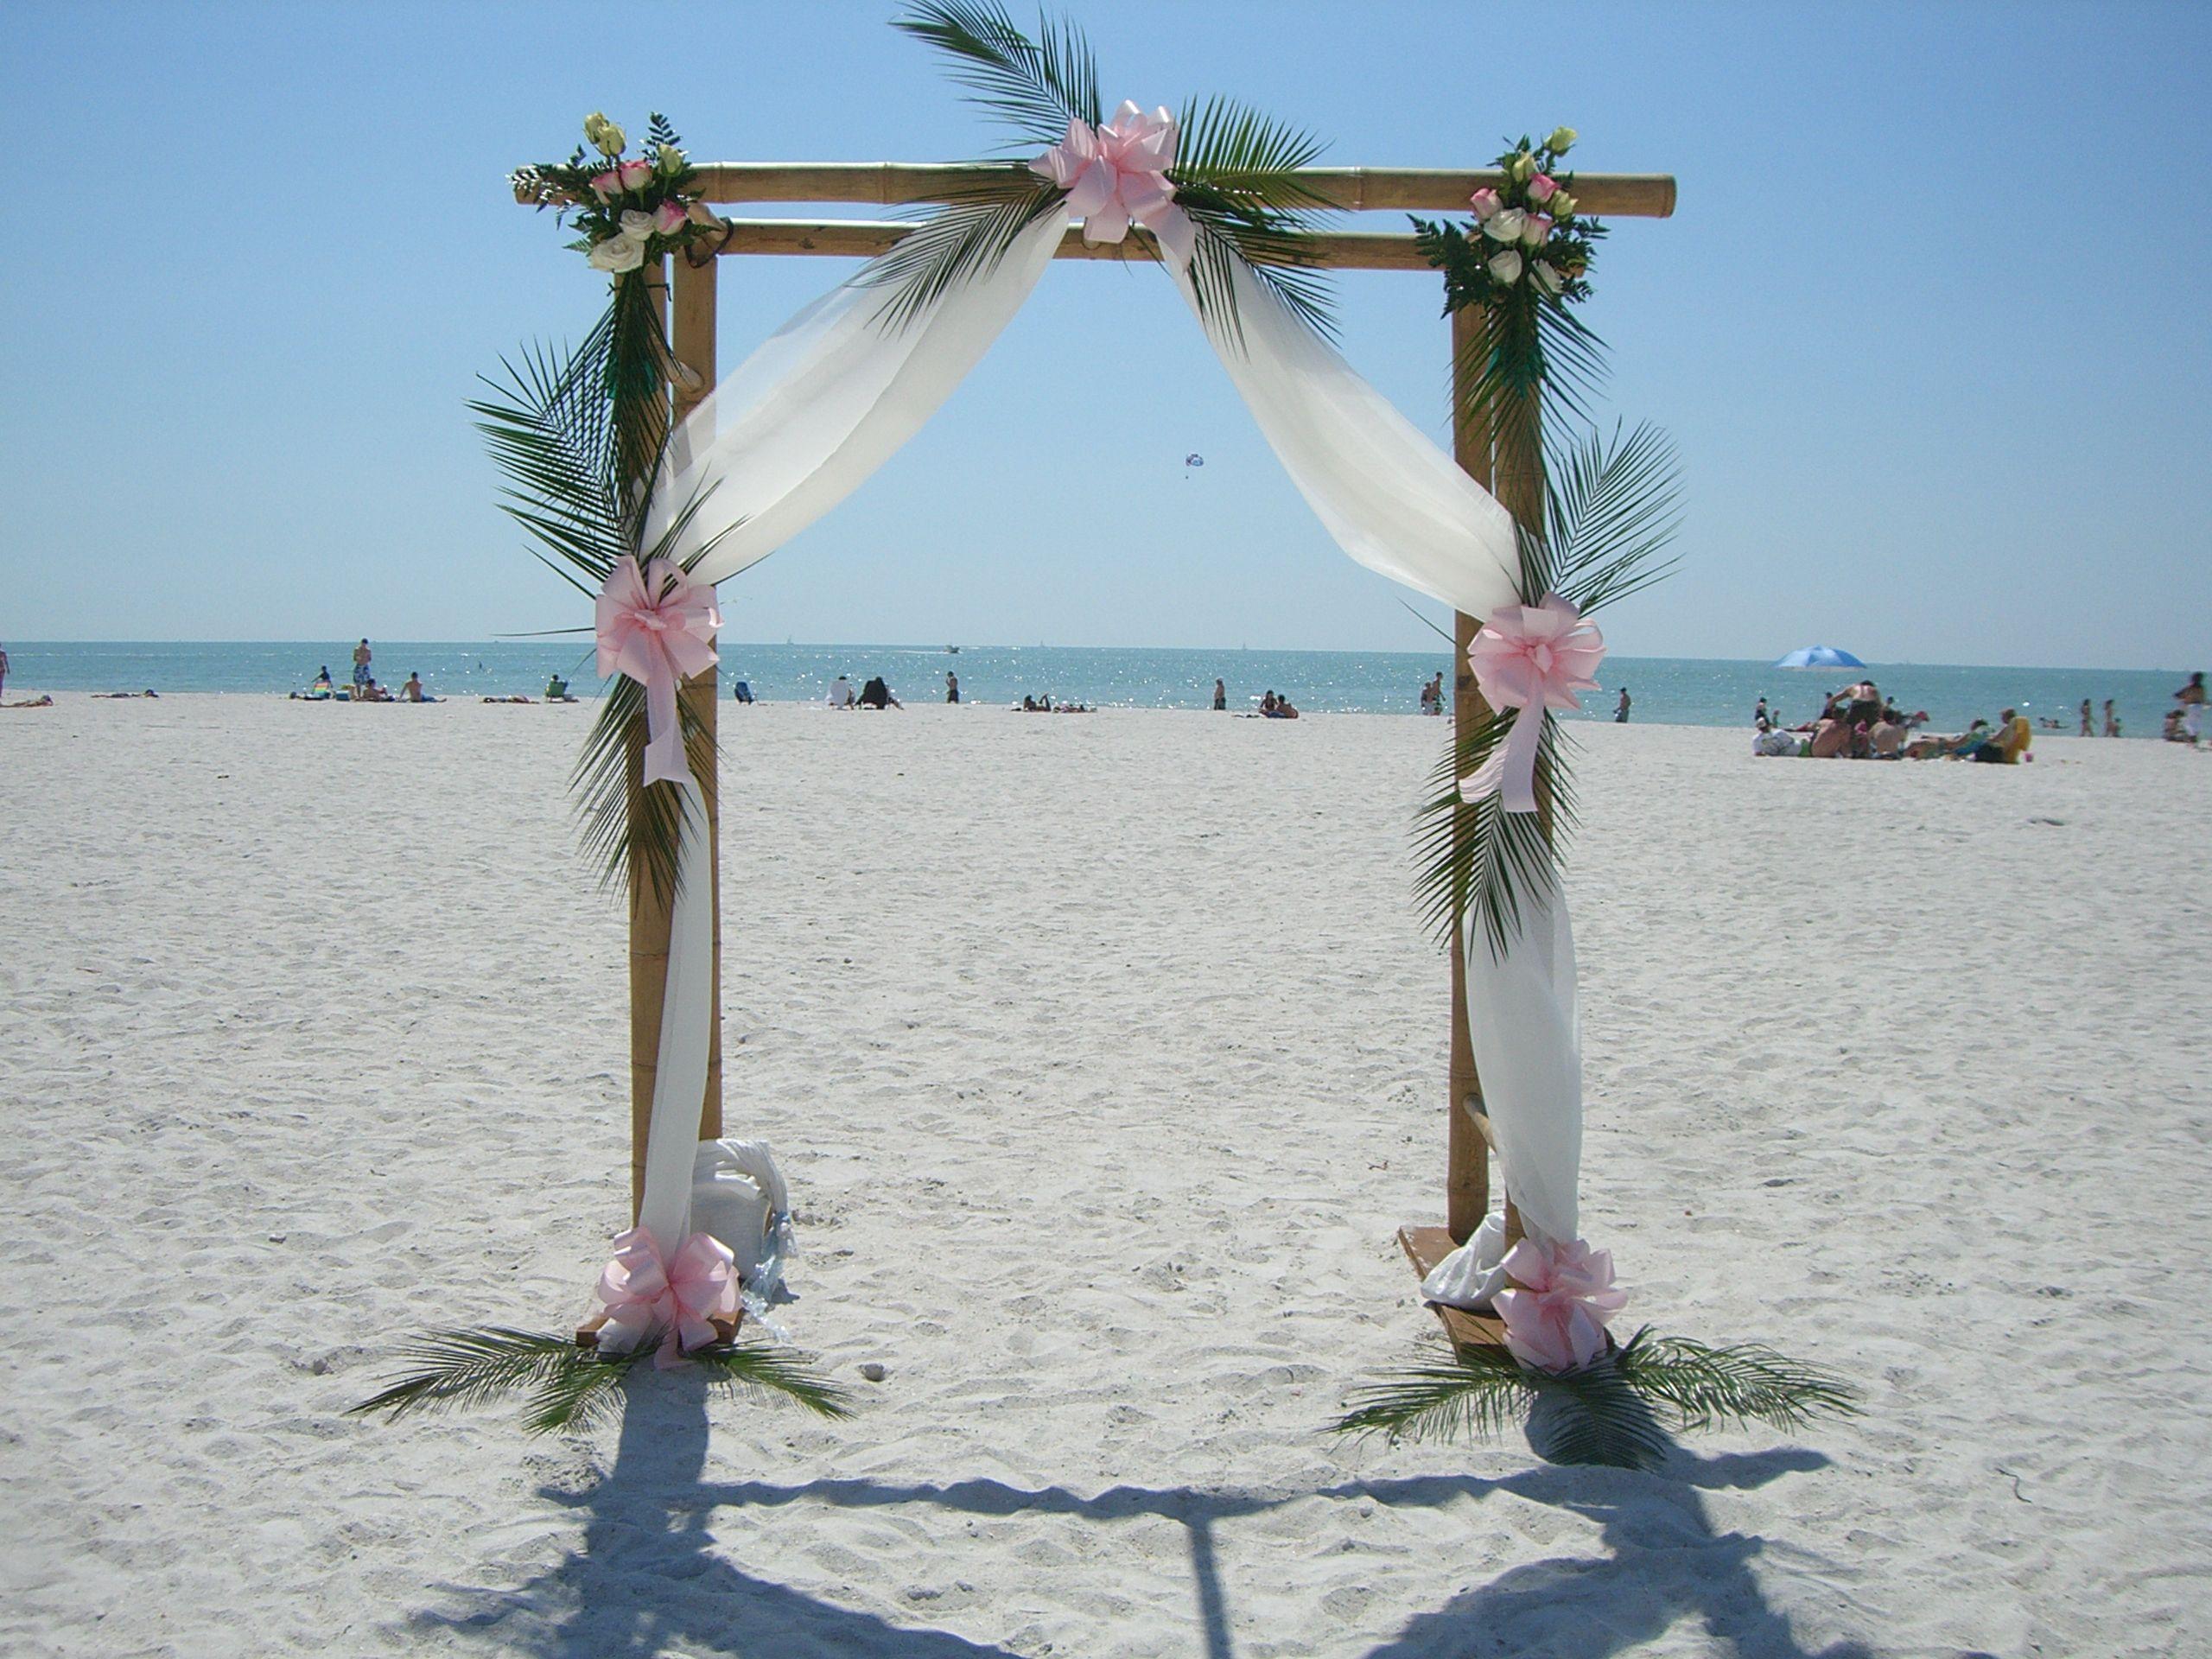 Beautiful bamboo arch for wedding ideas styles ideas 2018 sperr decorative bamboo arch weddings sirata style pinterest junglespirit Choice Image